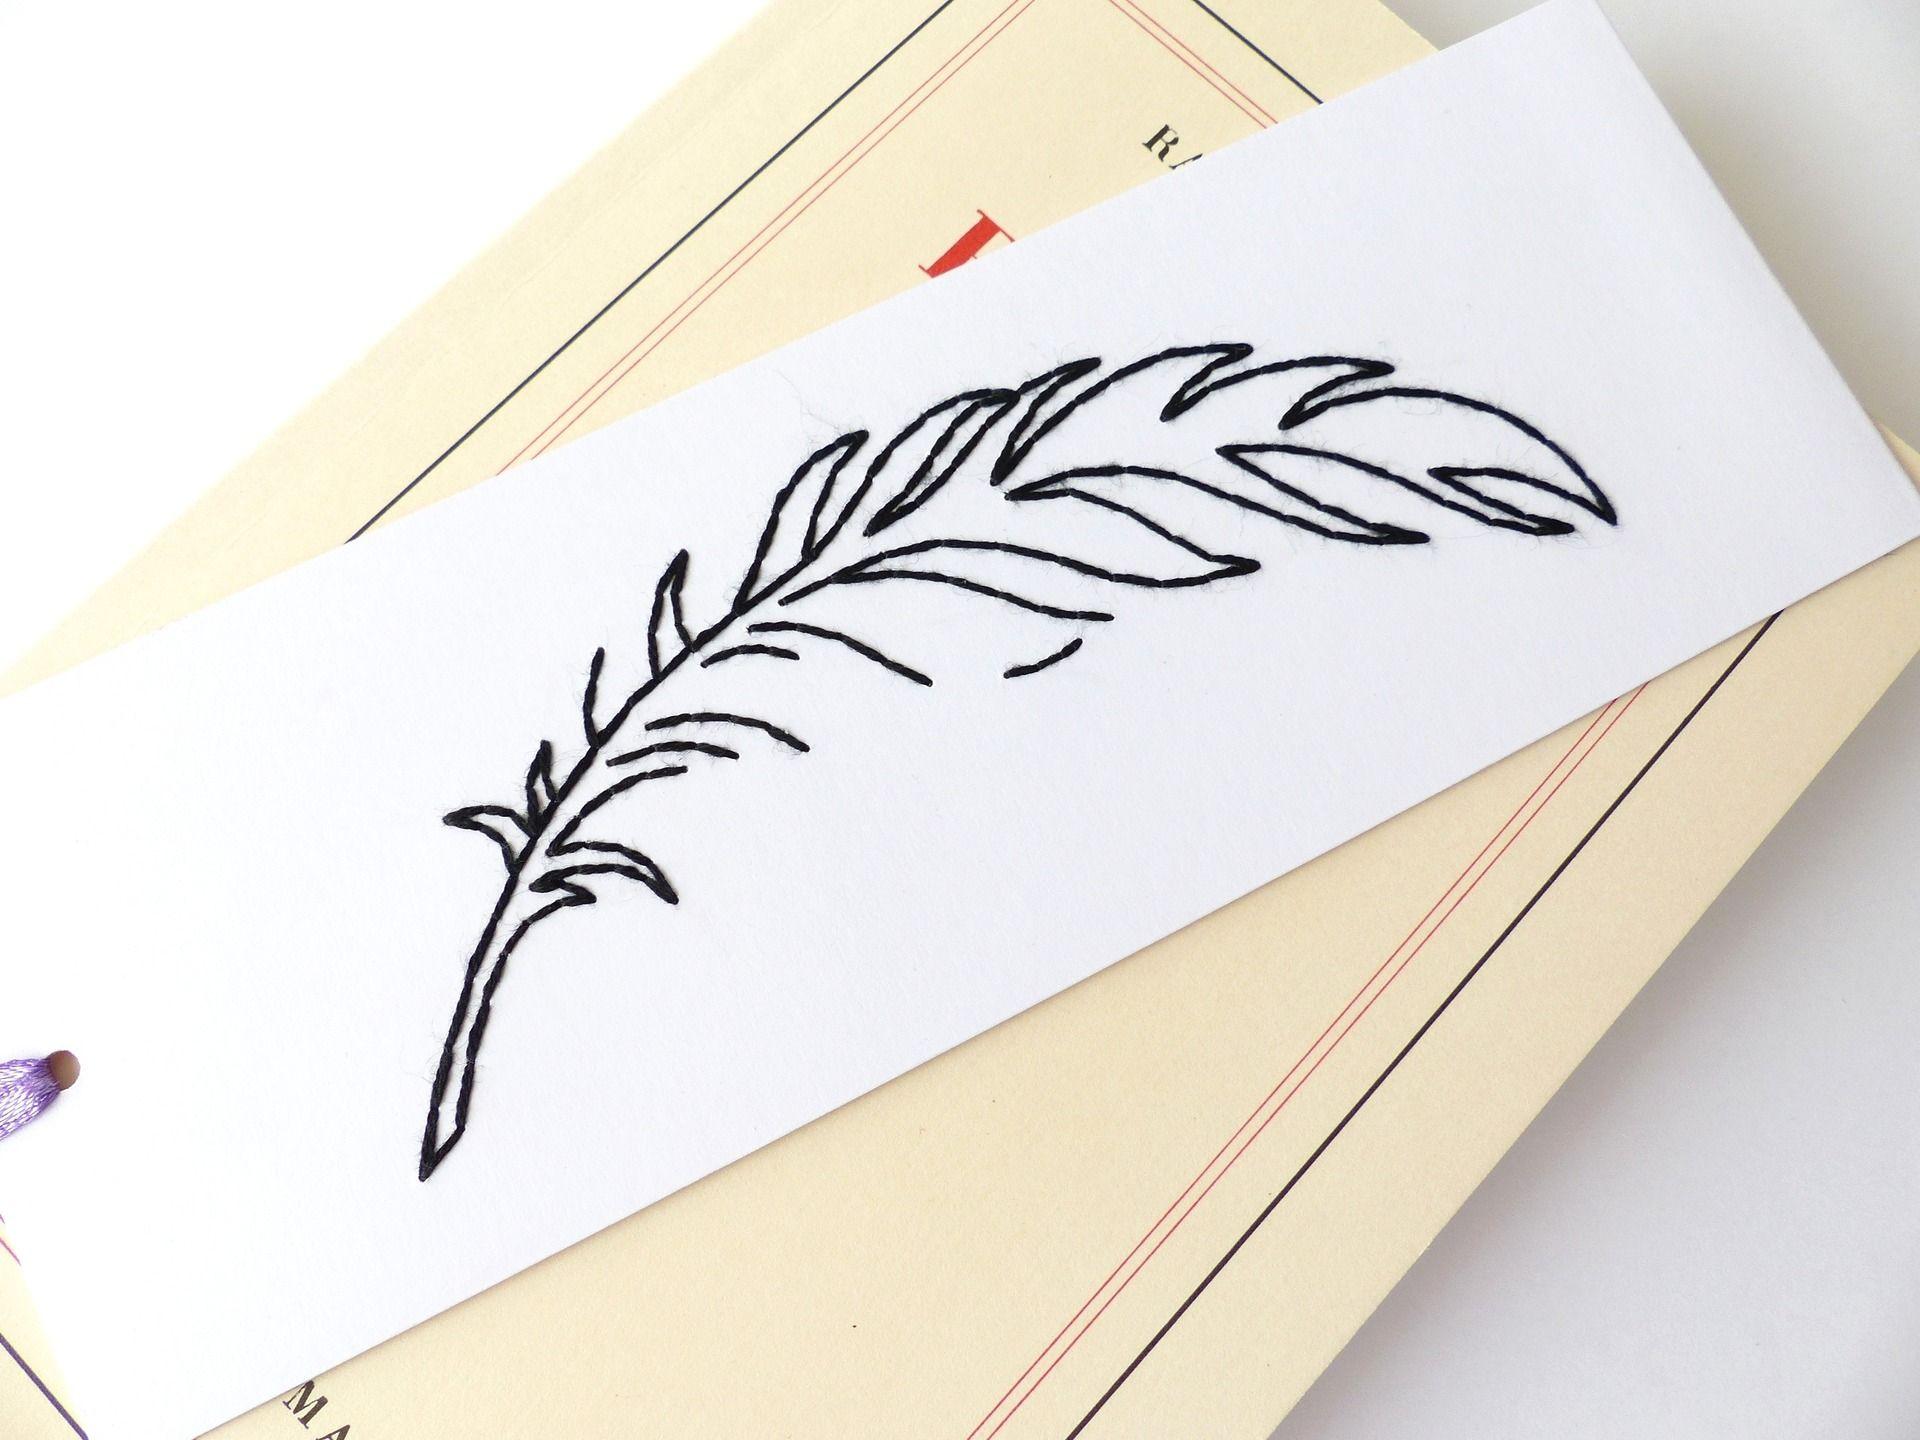 Dessin marque pages en papier - Marque page en papier ...